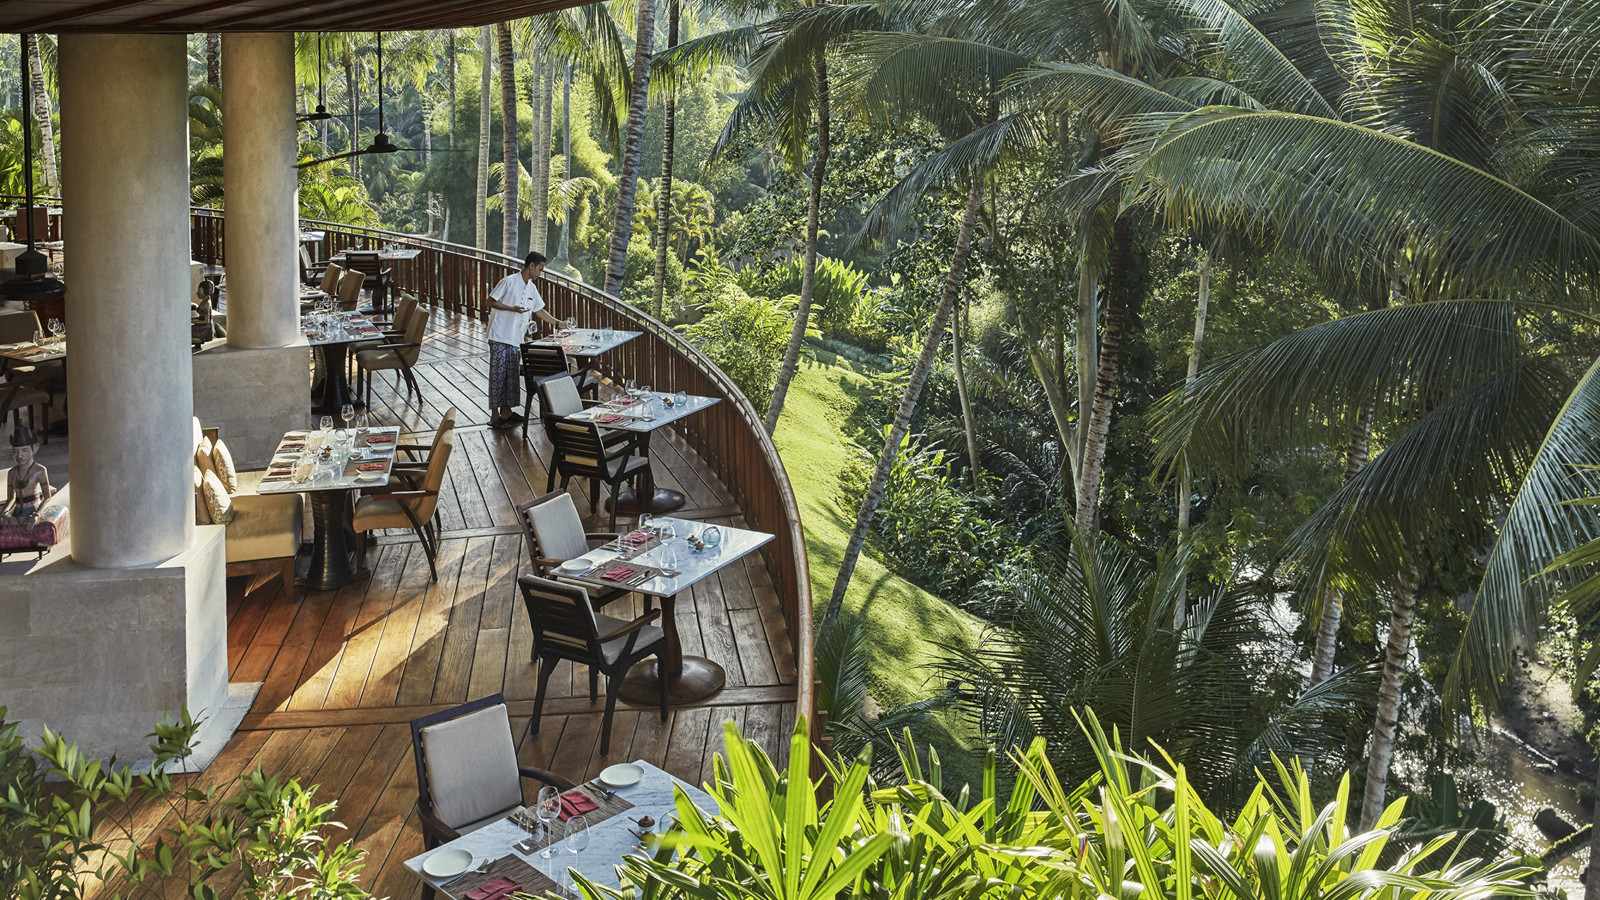 news-main-four-seasons-resort-bali-at-sayan-presents-new-dining-experience.1616155400.jpg